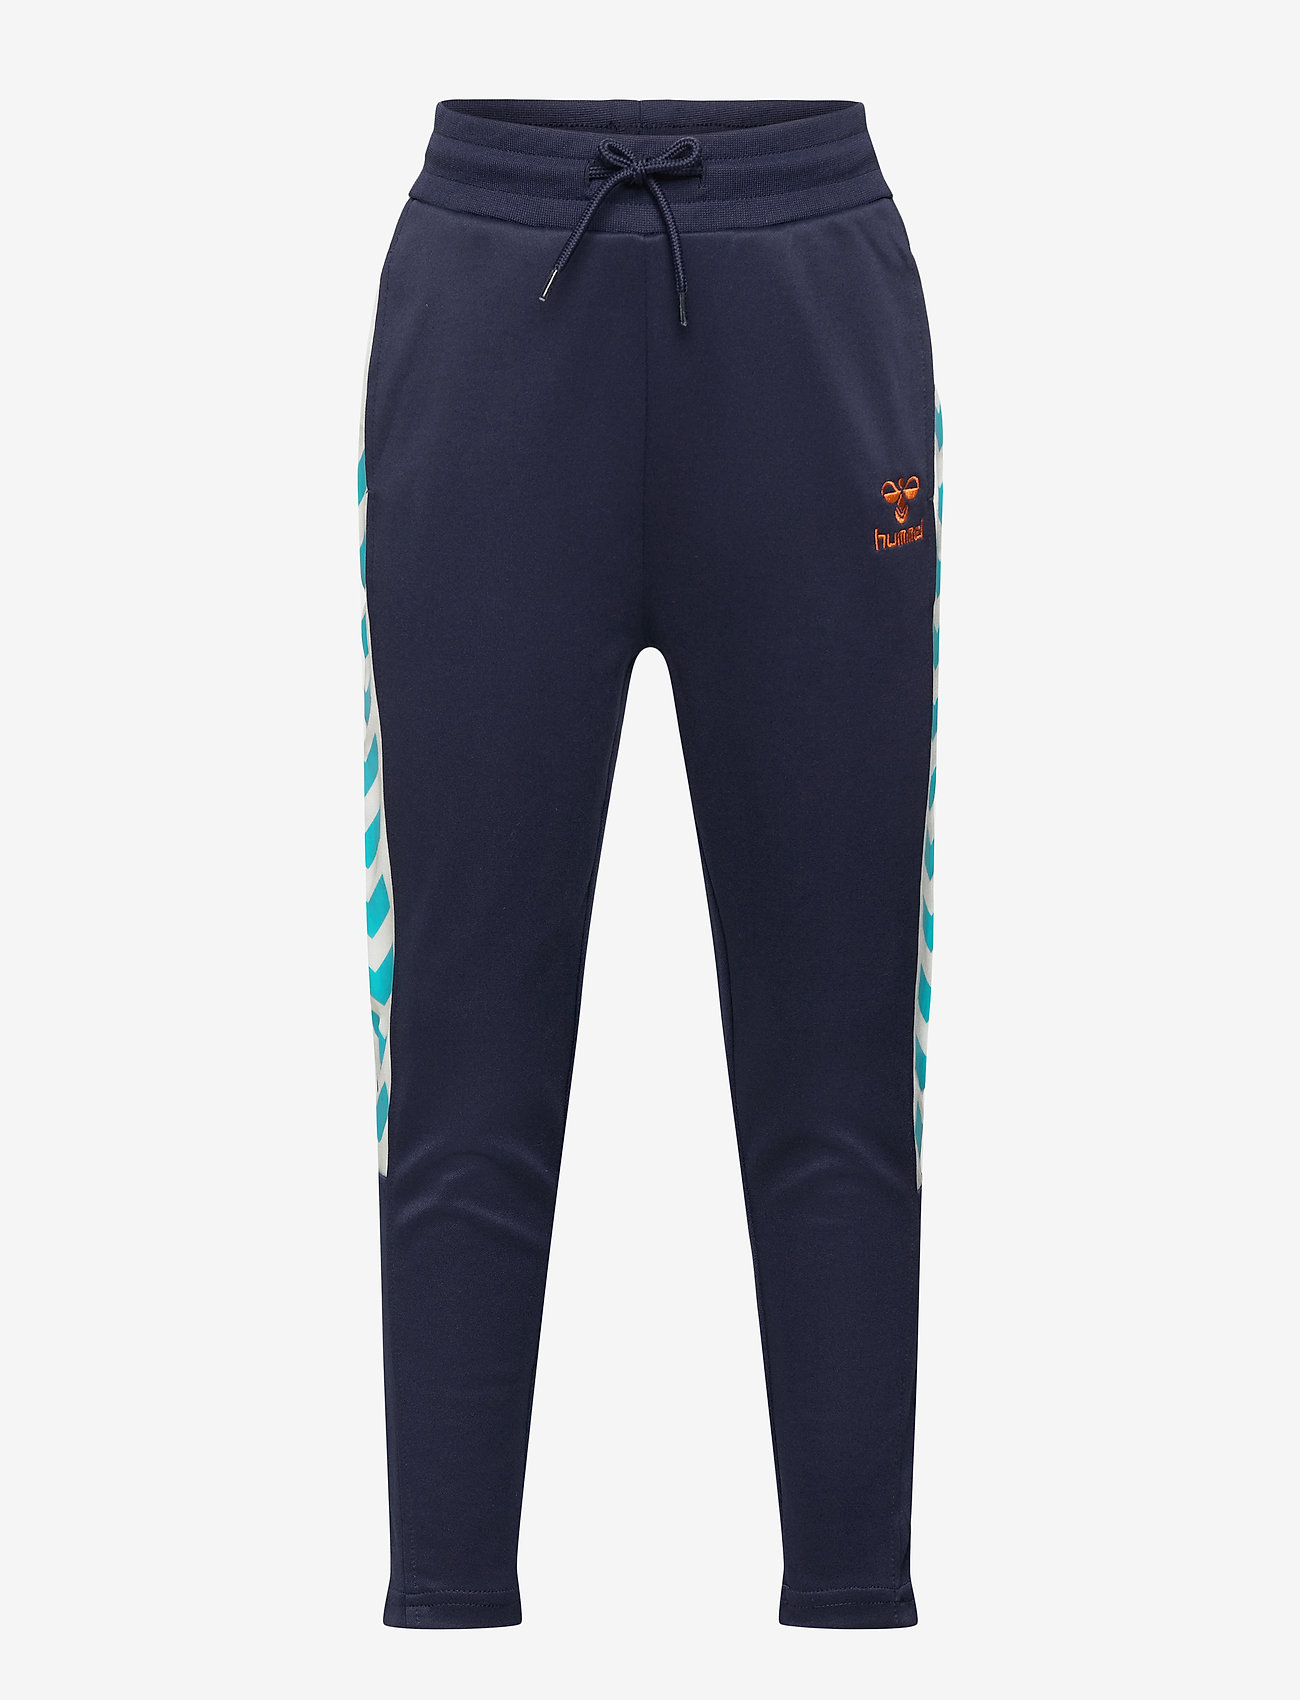 Hummel - hmlDENNIS PANTS - sweatpants - black iris - 0